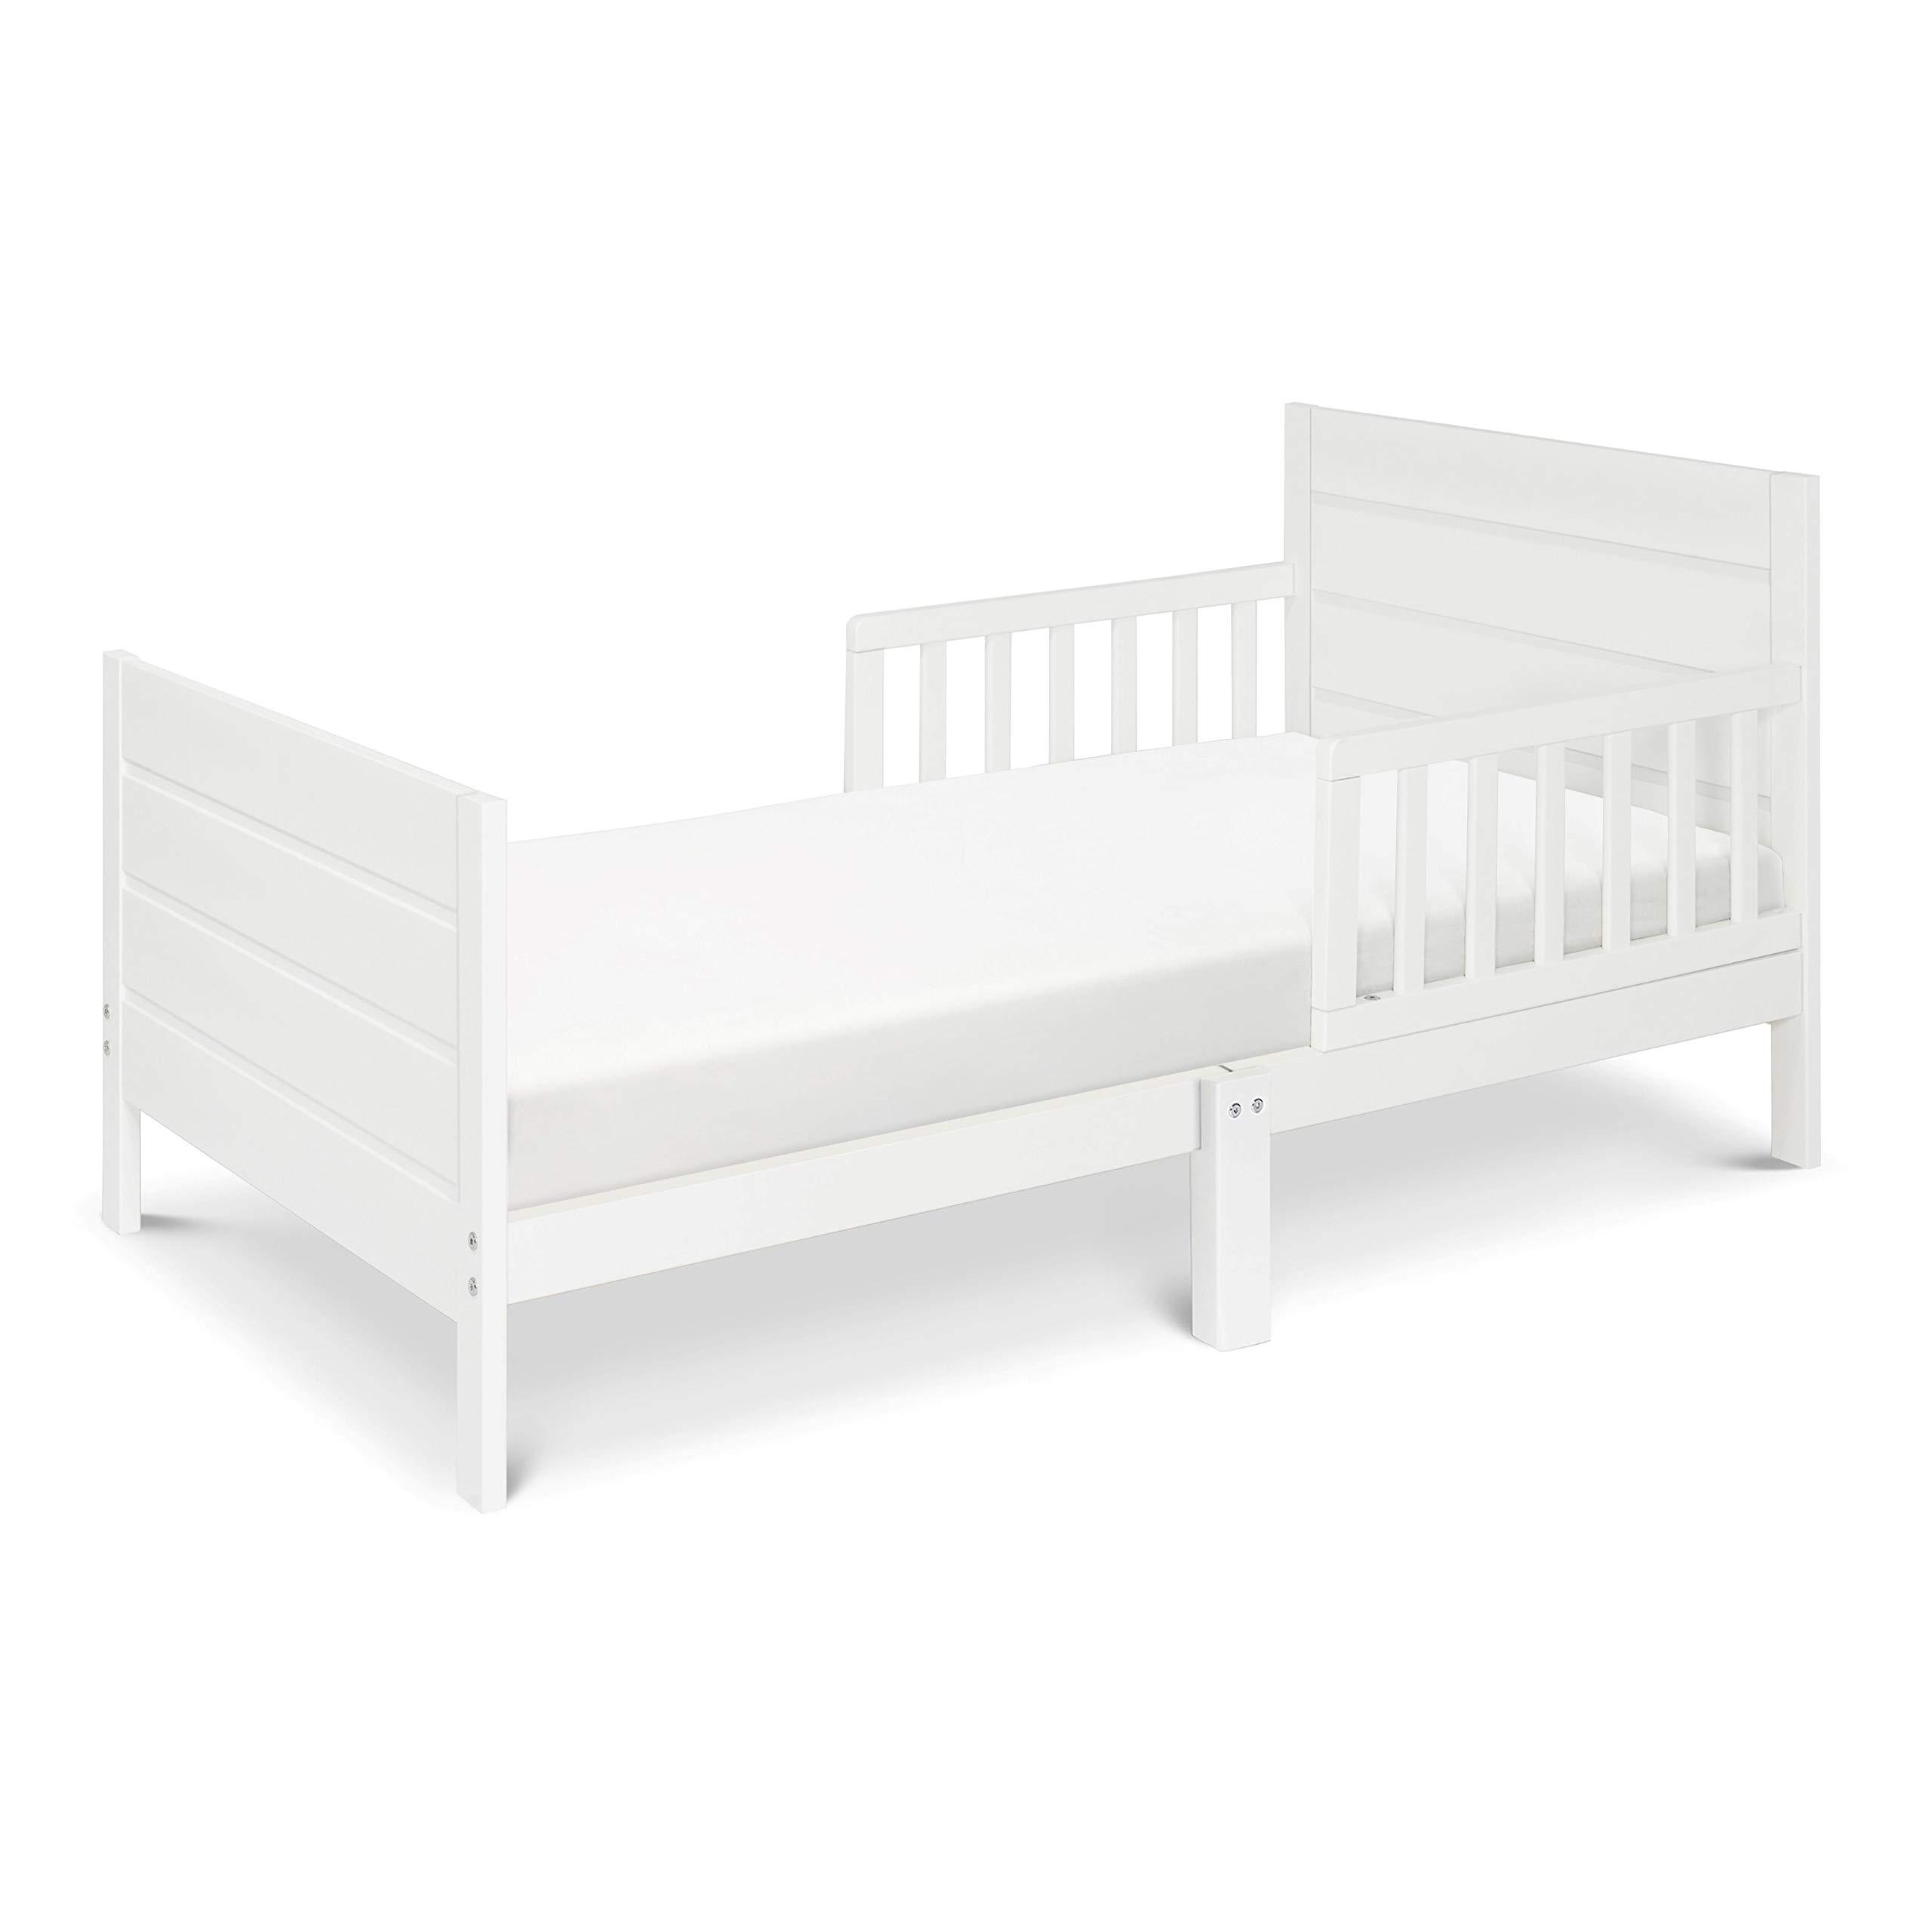 DaVinci Modena Toddler Bed - White by DaVinci